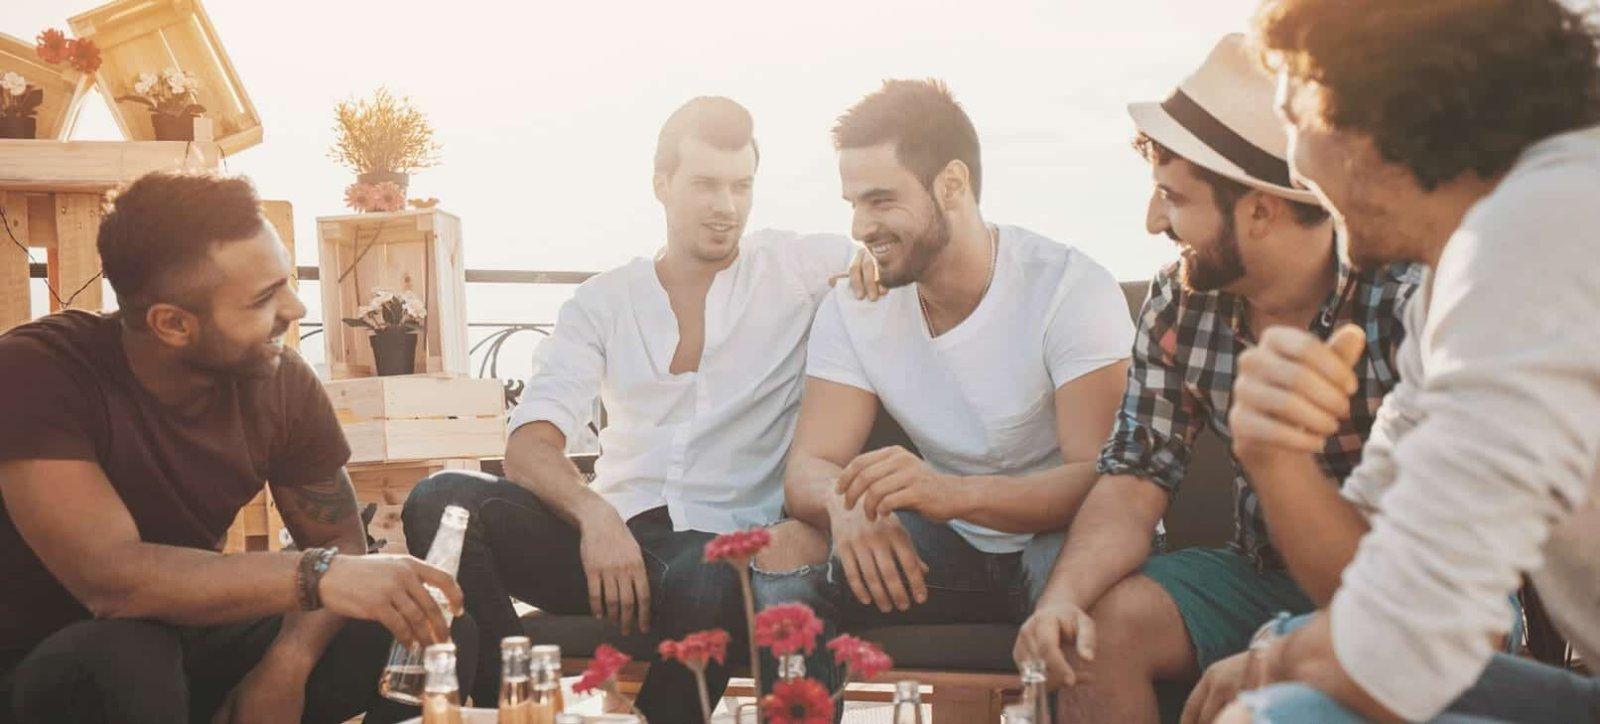 boys-having-beers-by-the-sea